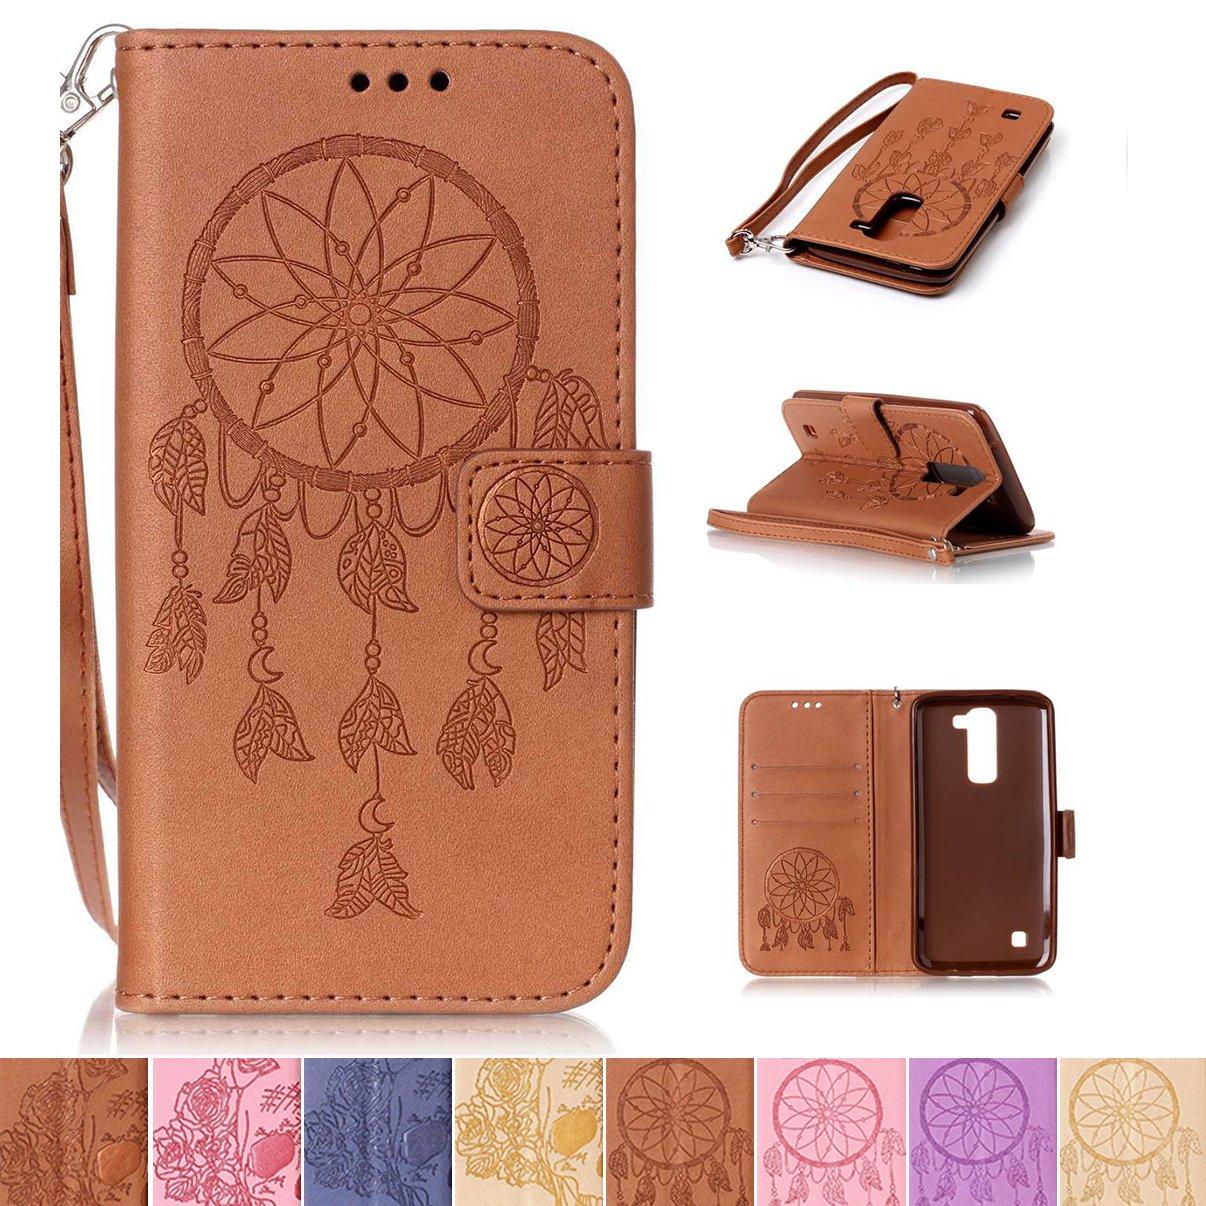 LG K7 / K8 Case, LG Tribute 5 Case, LG Escape 3 Case, Firefish [Kickstand] [Card/Cash Slots] Wallet Folio [Magnetic Closure] Case with Wrist Strap for LG K7/ K8/ Tribute 5/ Escape 3- Net-B